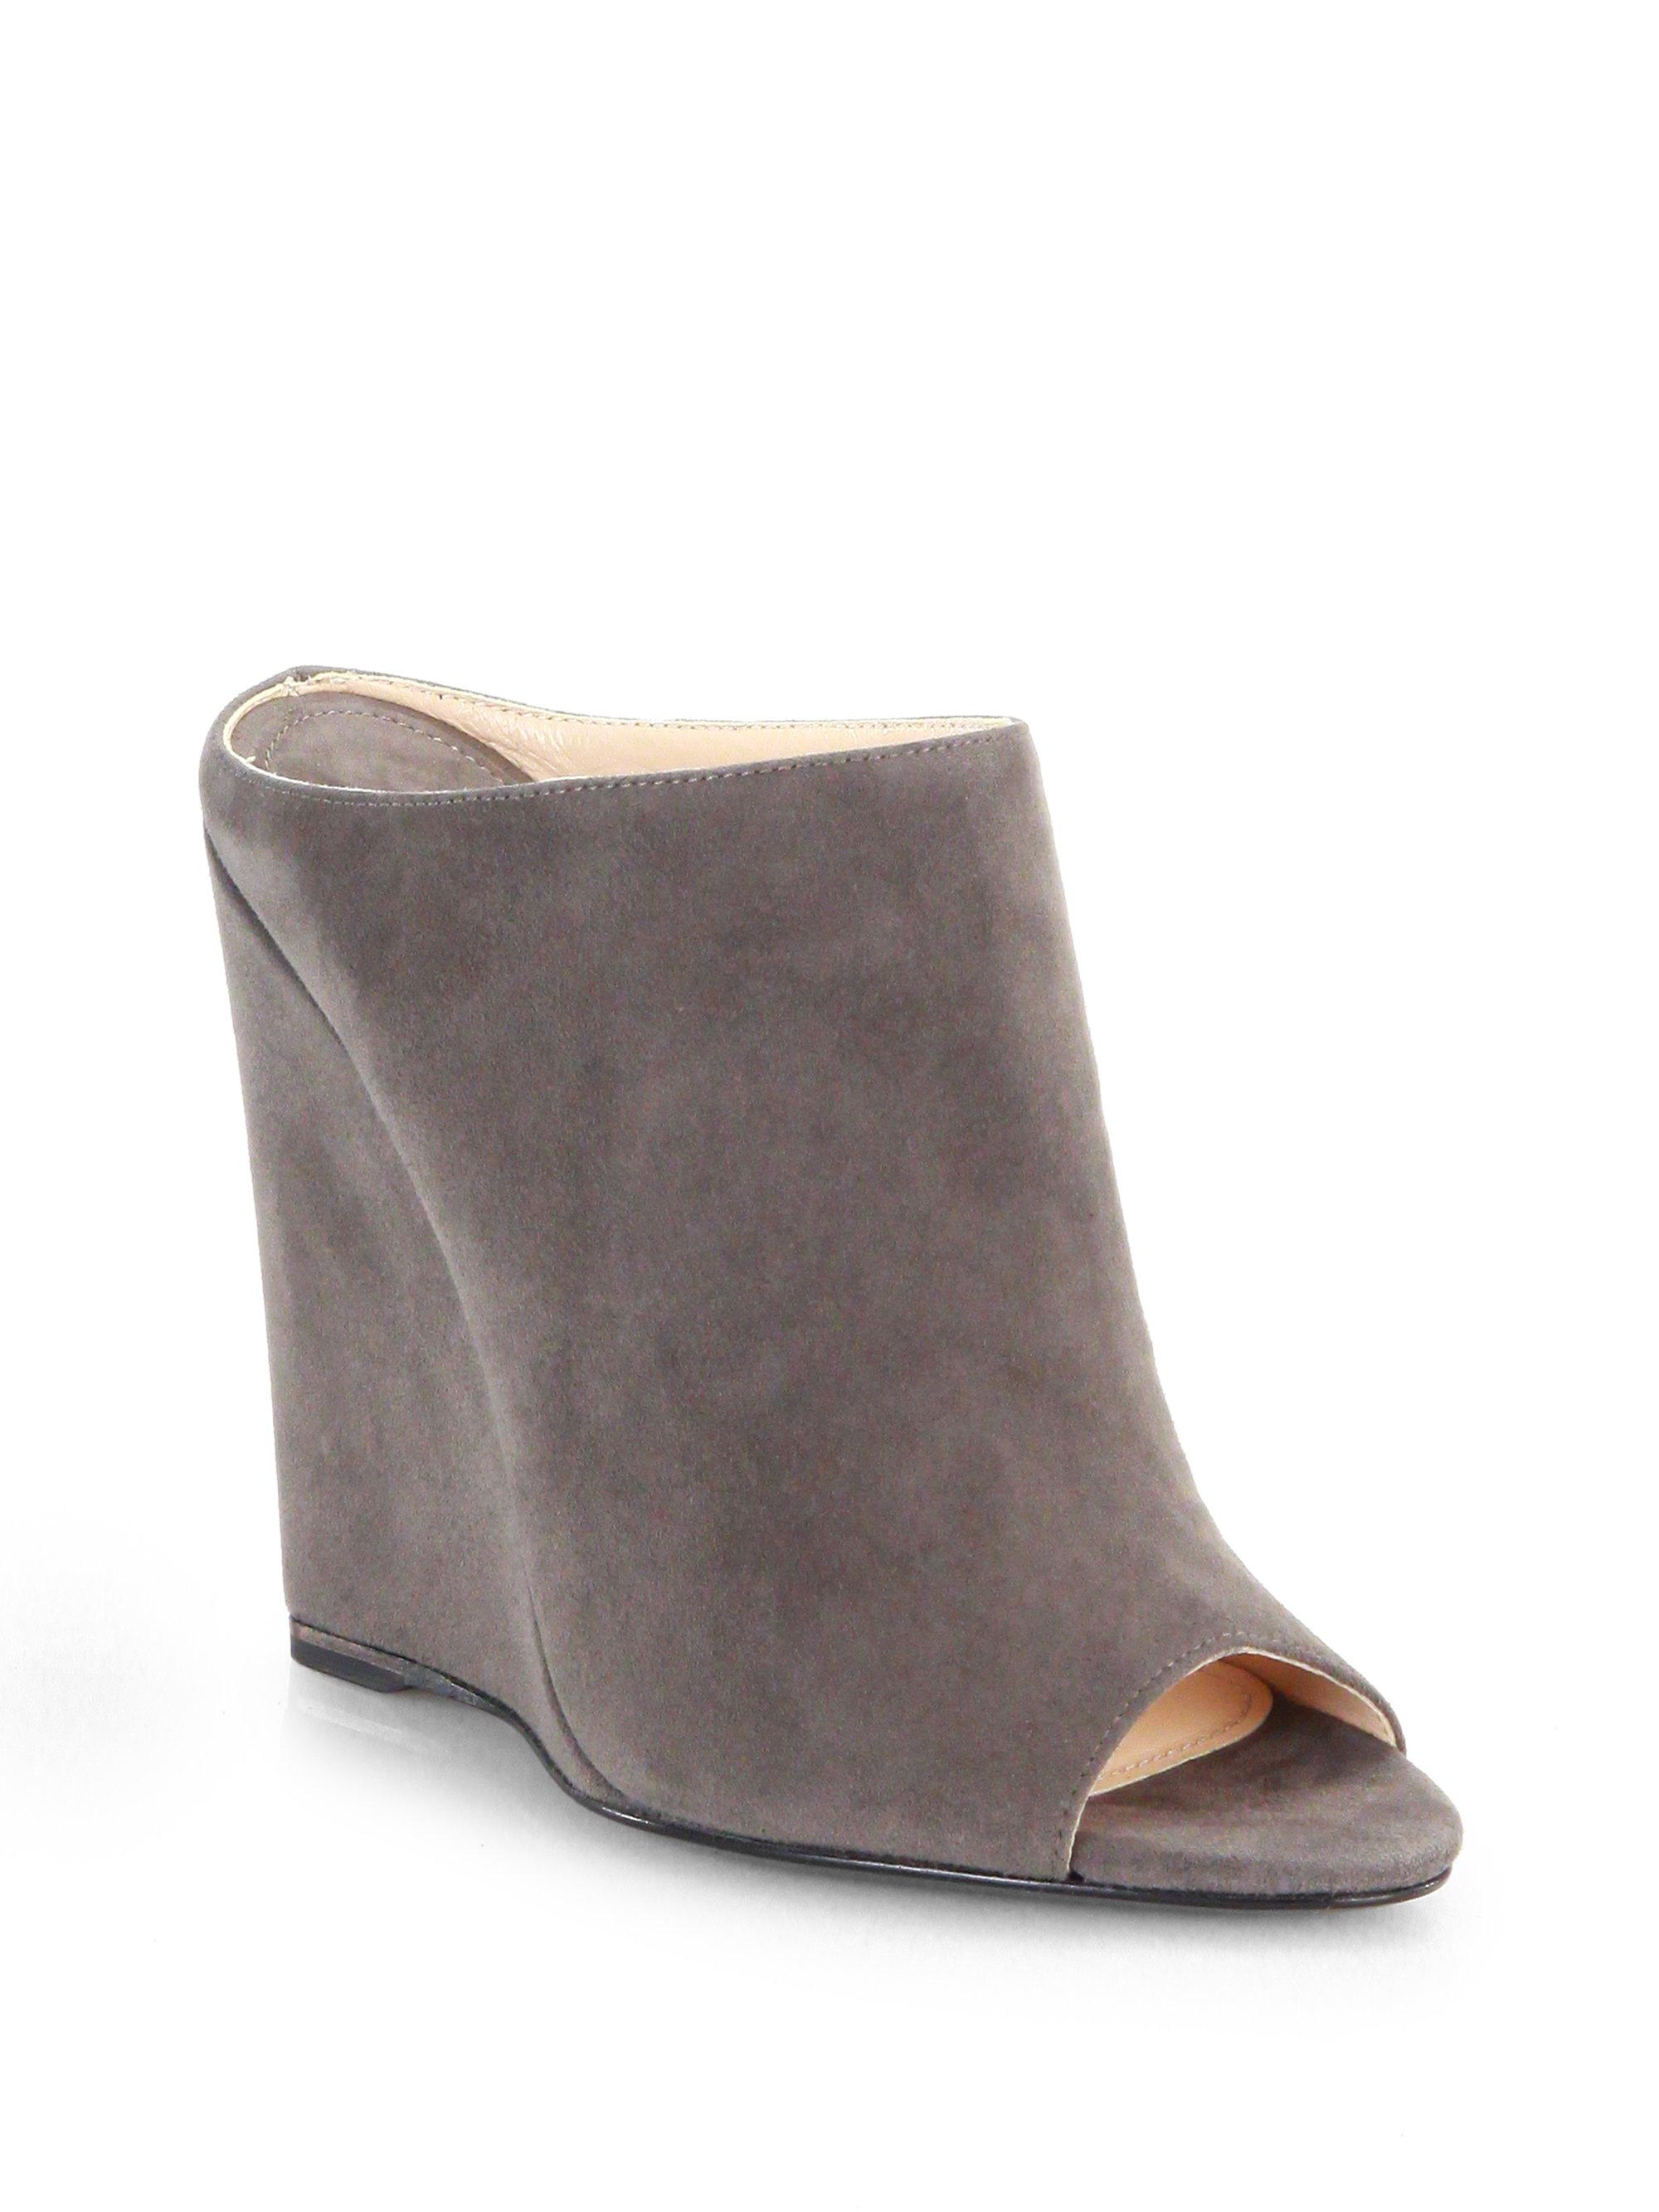 prada suede open toe wedge slides in gray grigio grey lyst